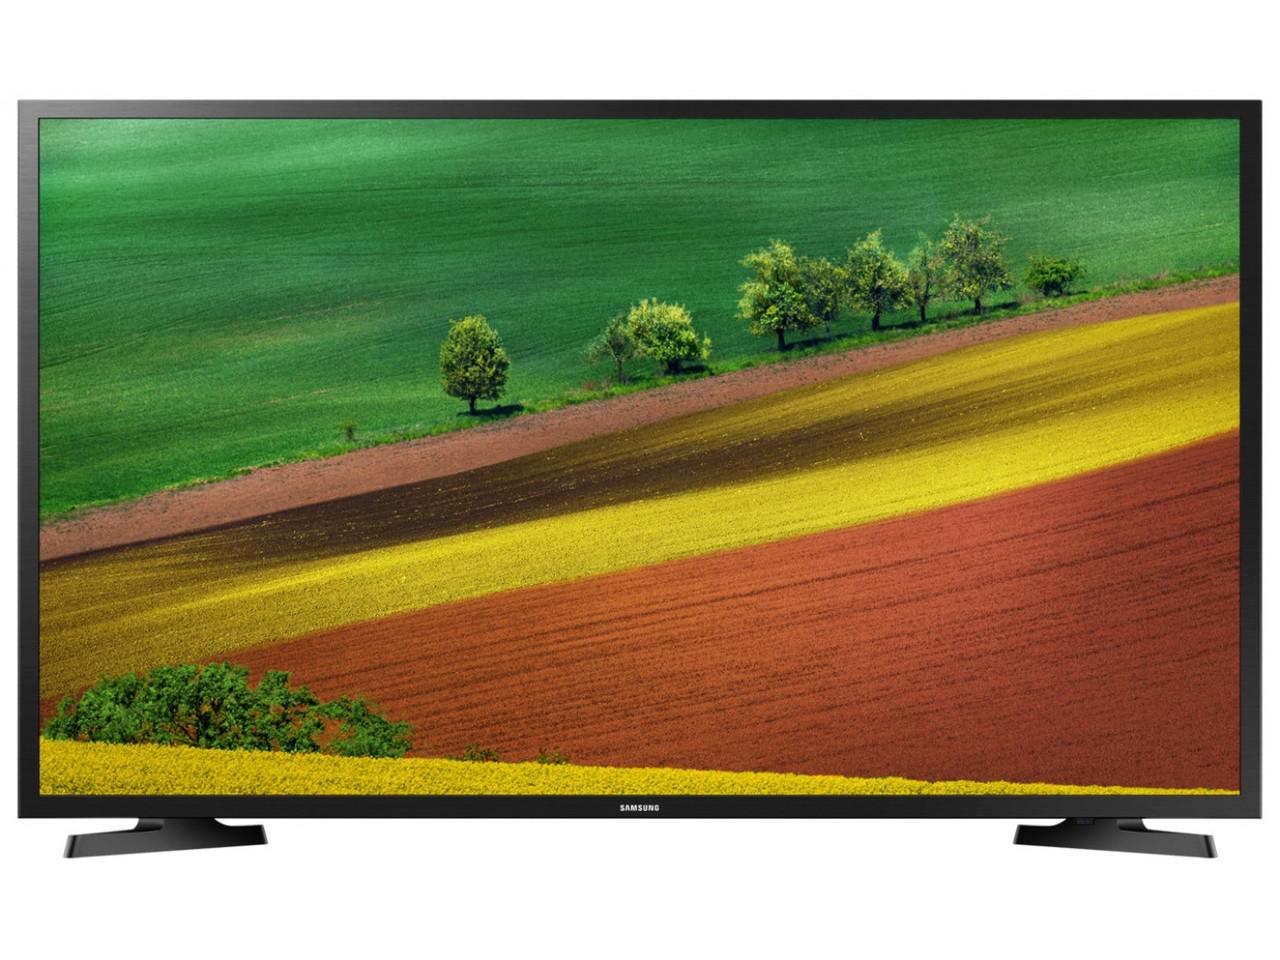 Телевизор Samsung UE32N5000AUXUA (Магазин М8)